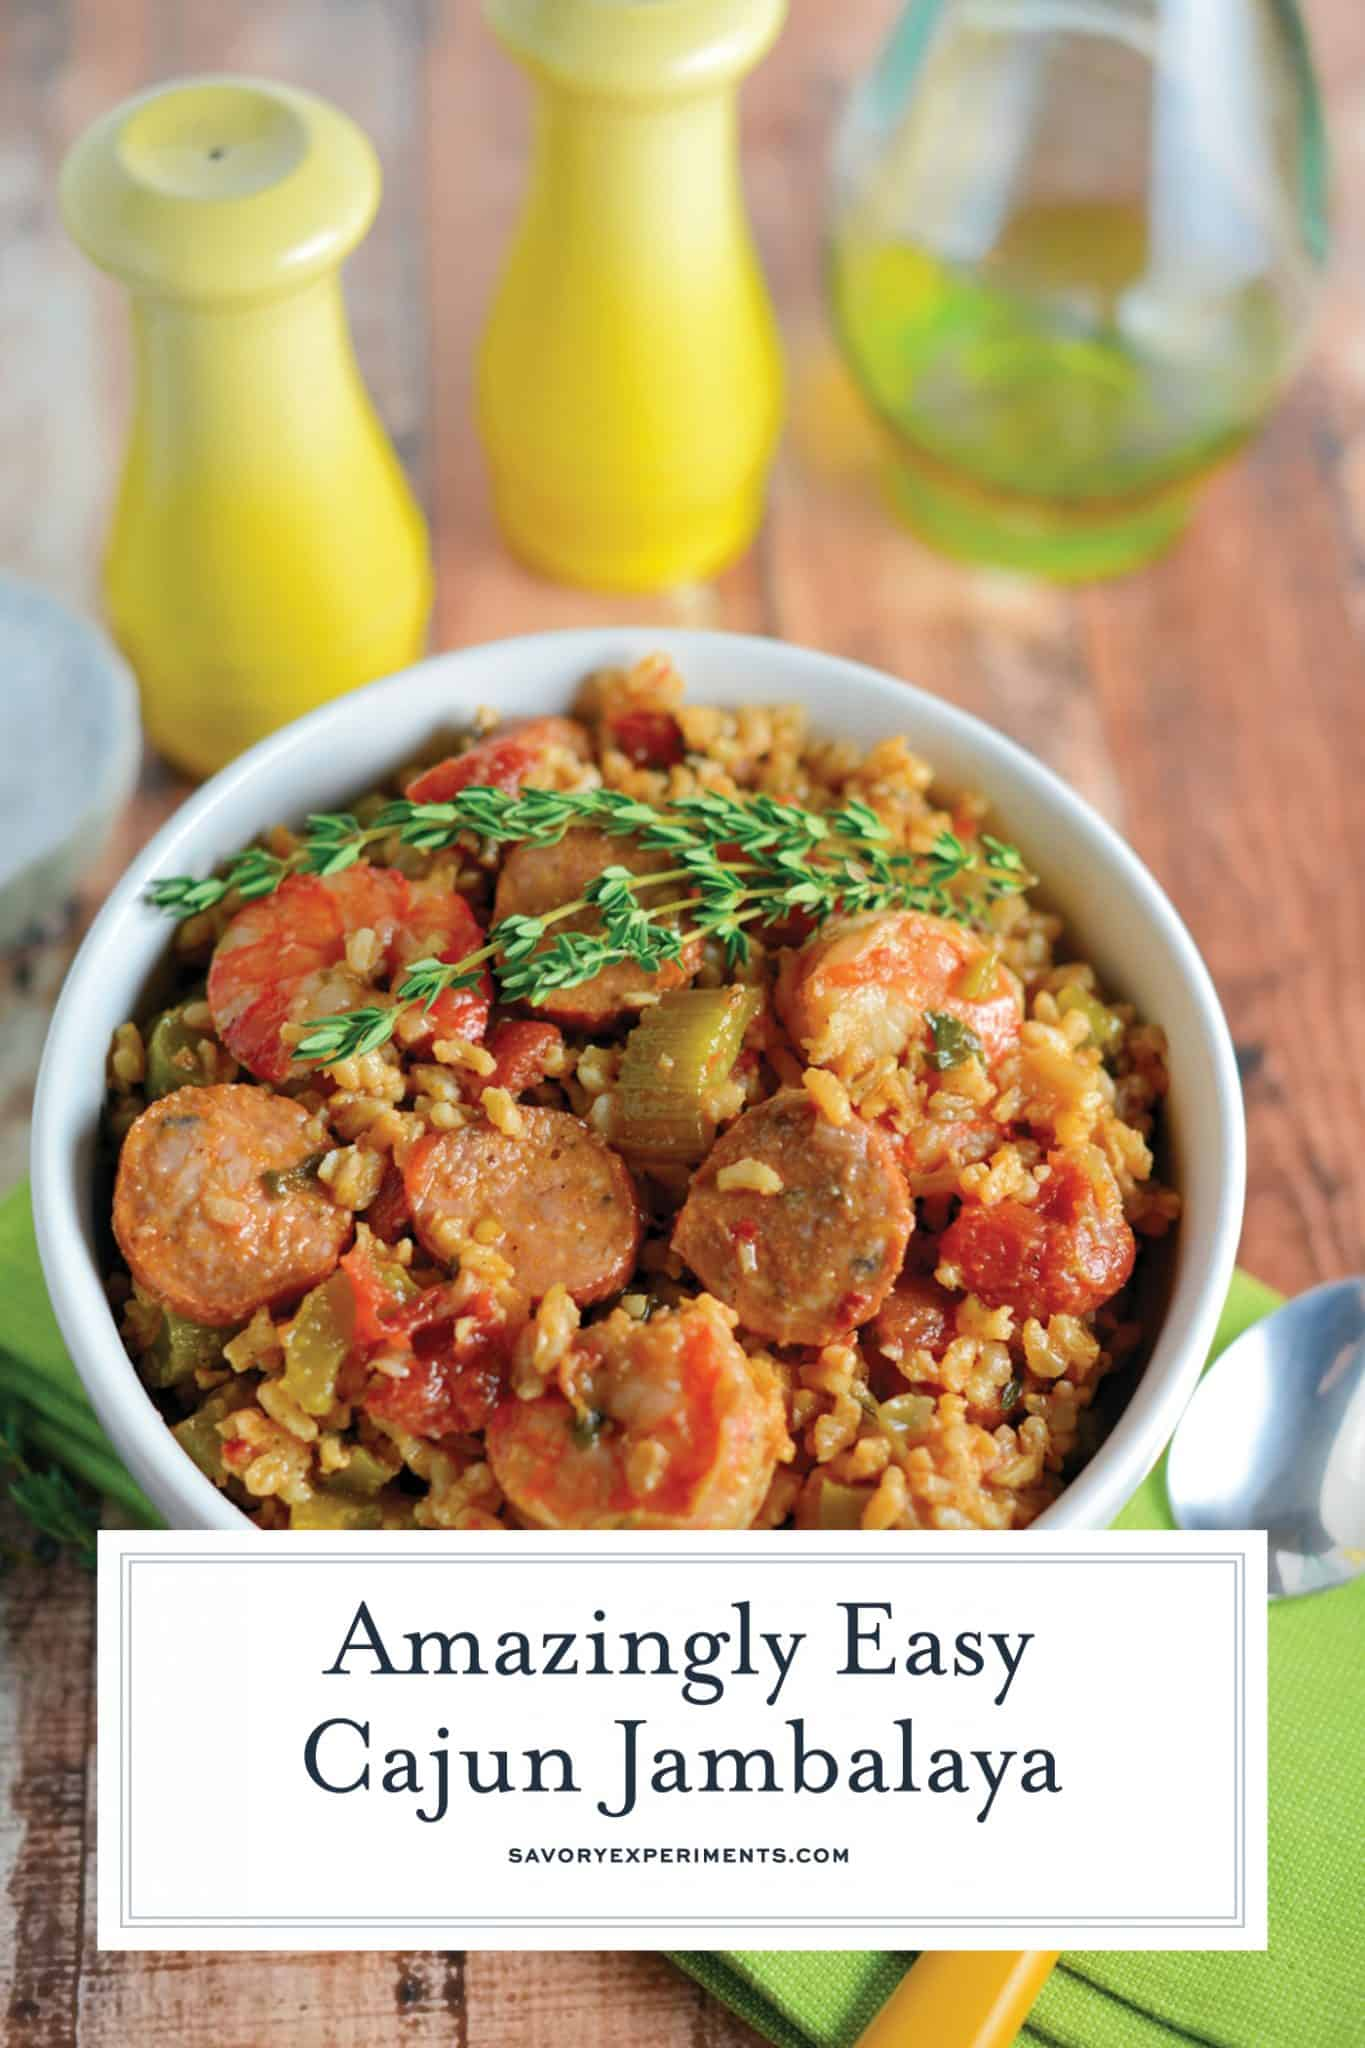 This Cajun Jambalaya is a mouthwatering recipe that can be ready in less than an hour. Andouille turkey sausage and shrimp give this recipe so much flavor! #cajunjambalaya #healthyjambalaya #easyjambalaya www.savoryexperiments.com